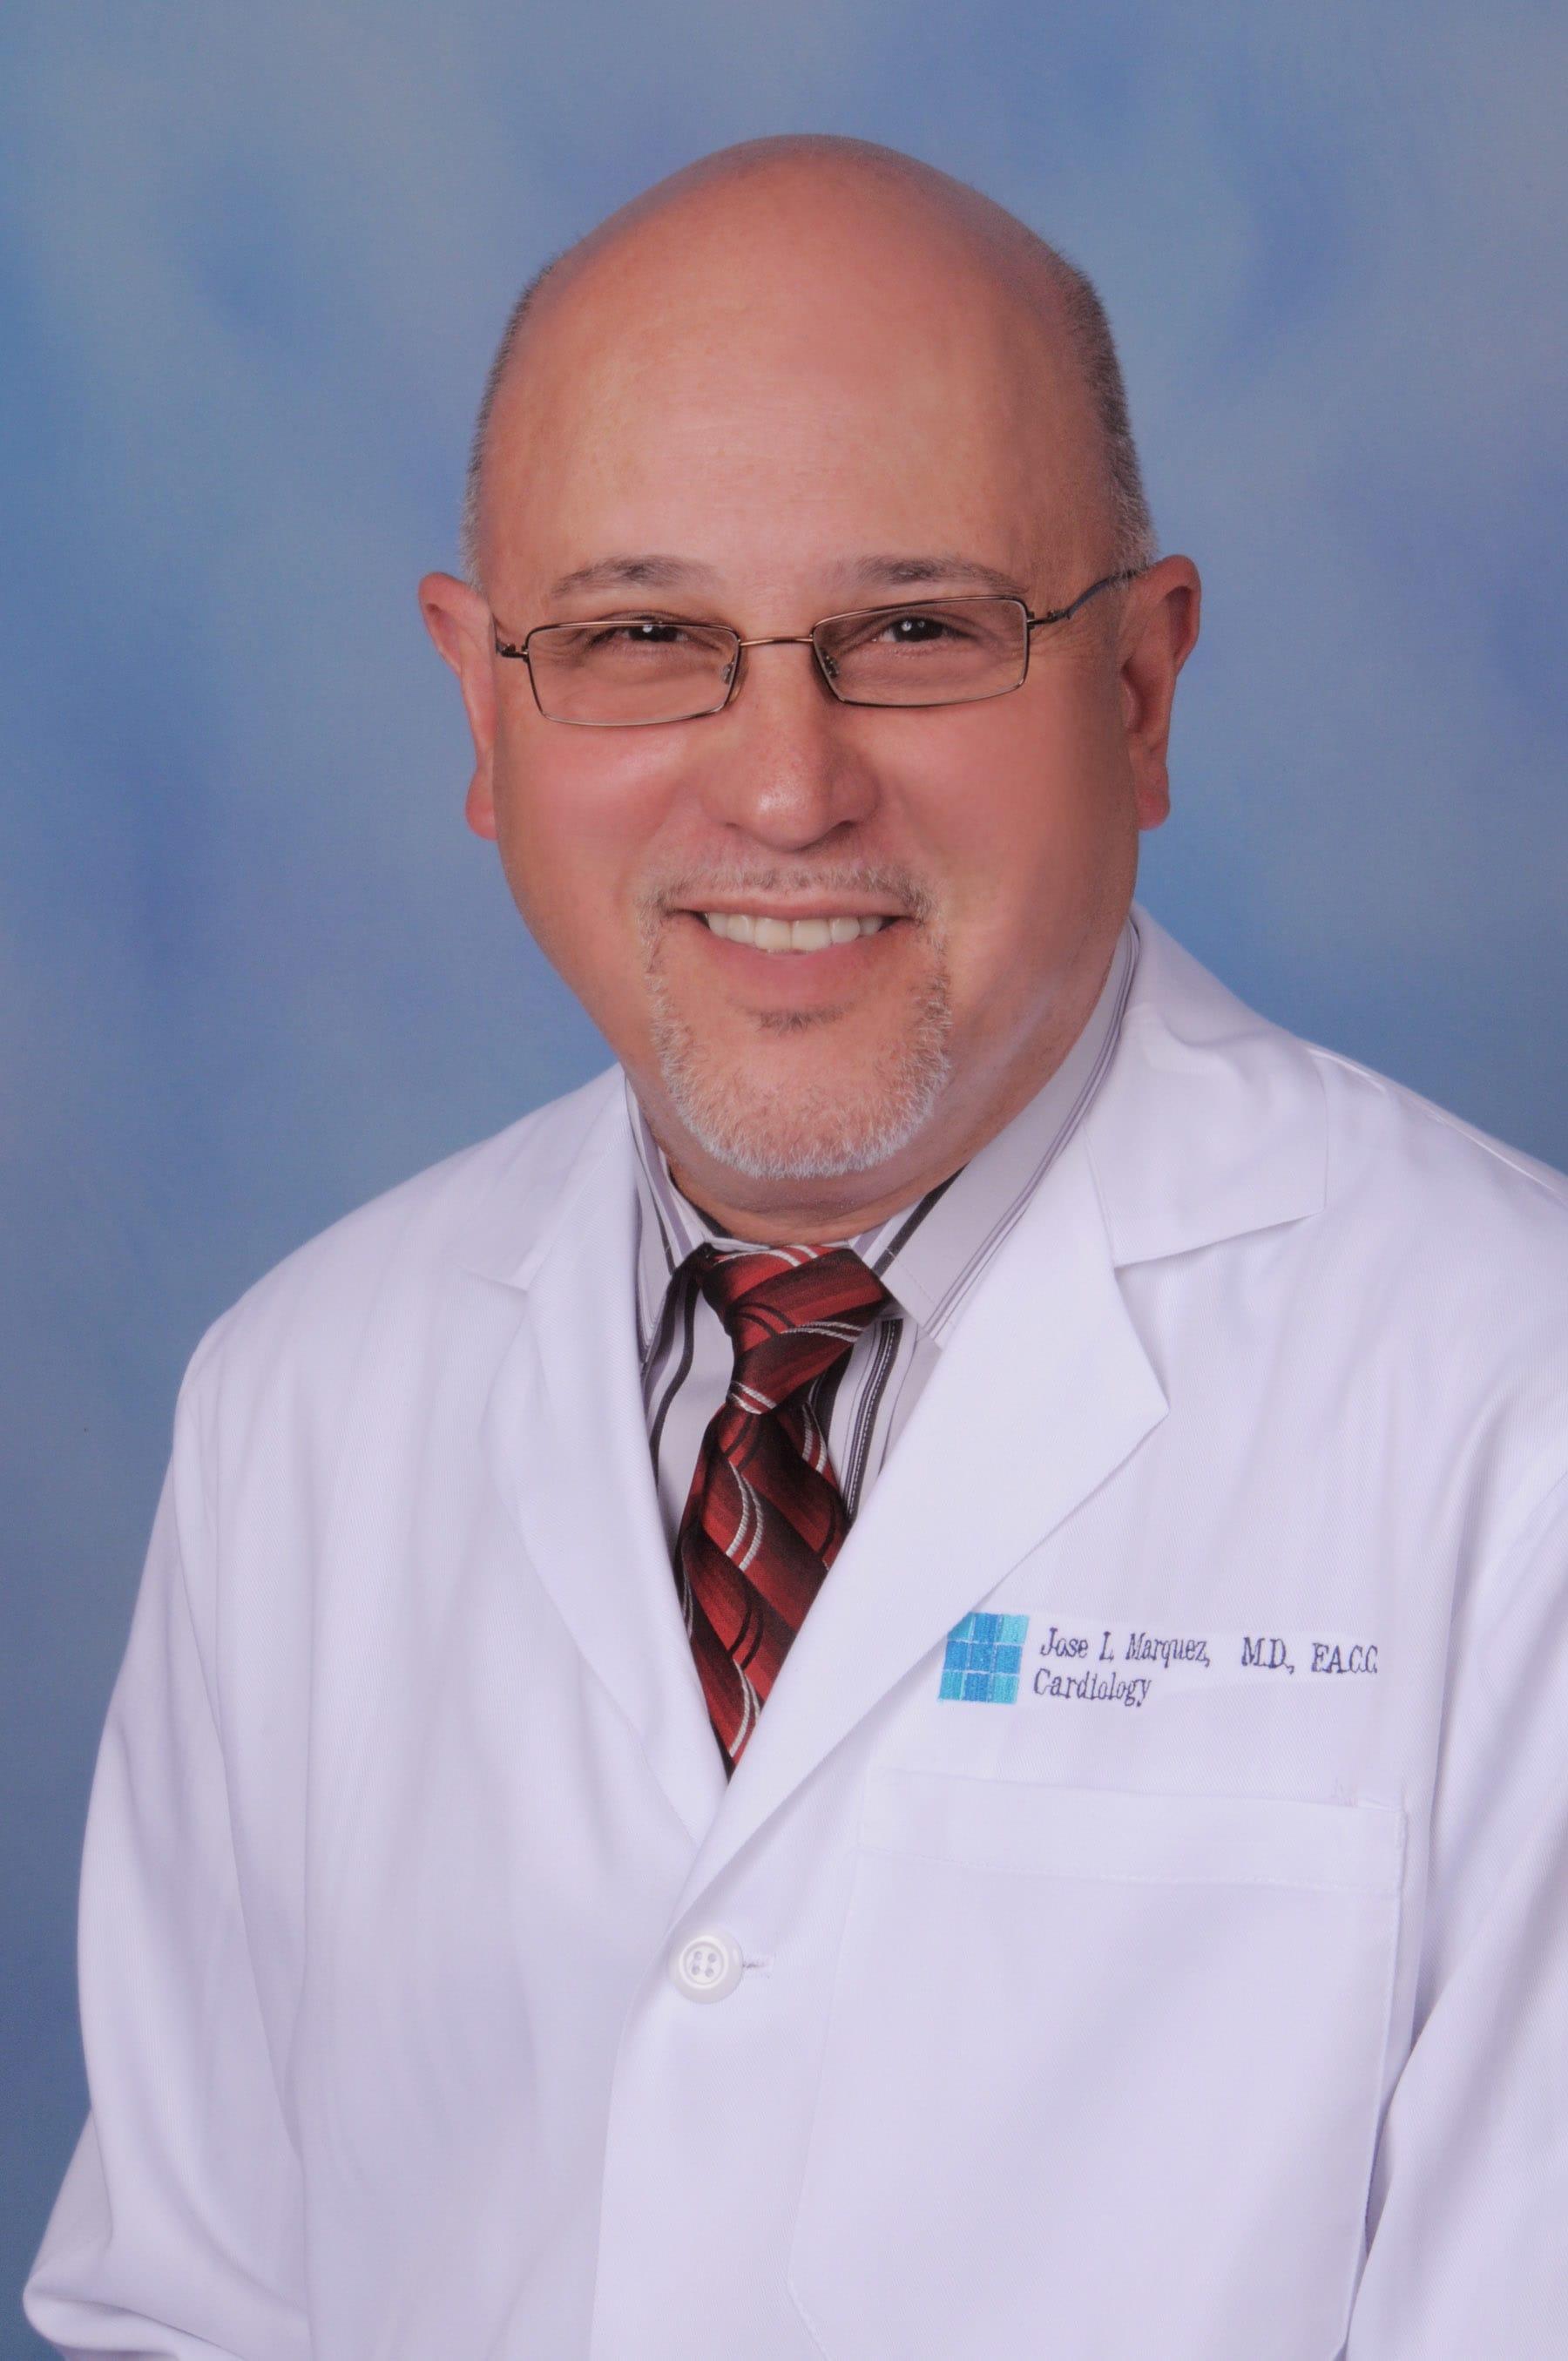 Jose L Marquez, MD Cardiovascular Disease